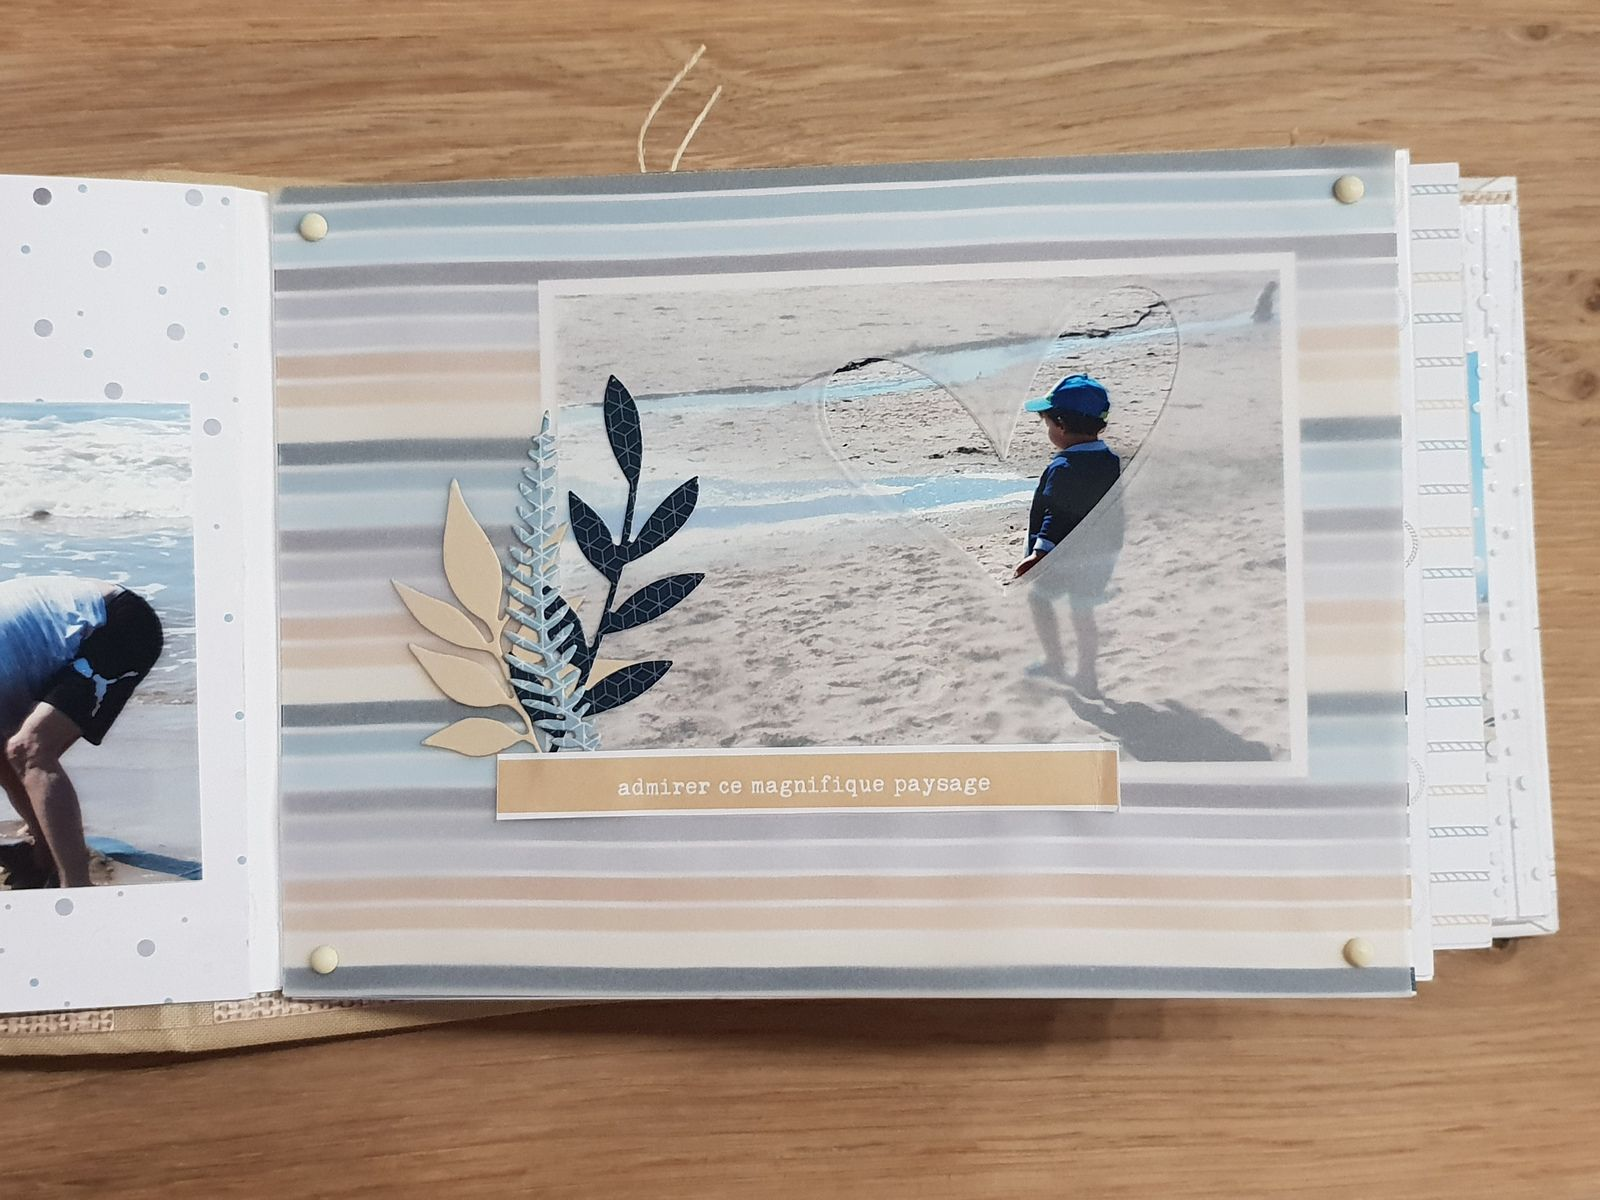 Elodie - Album un air marin